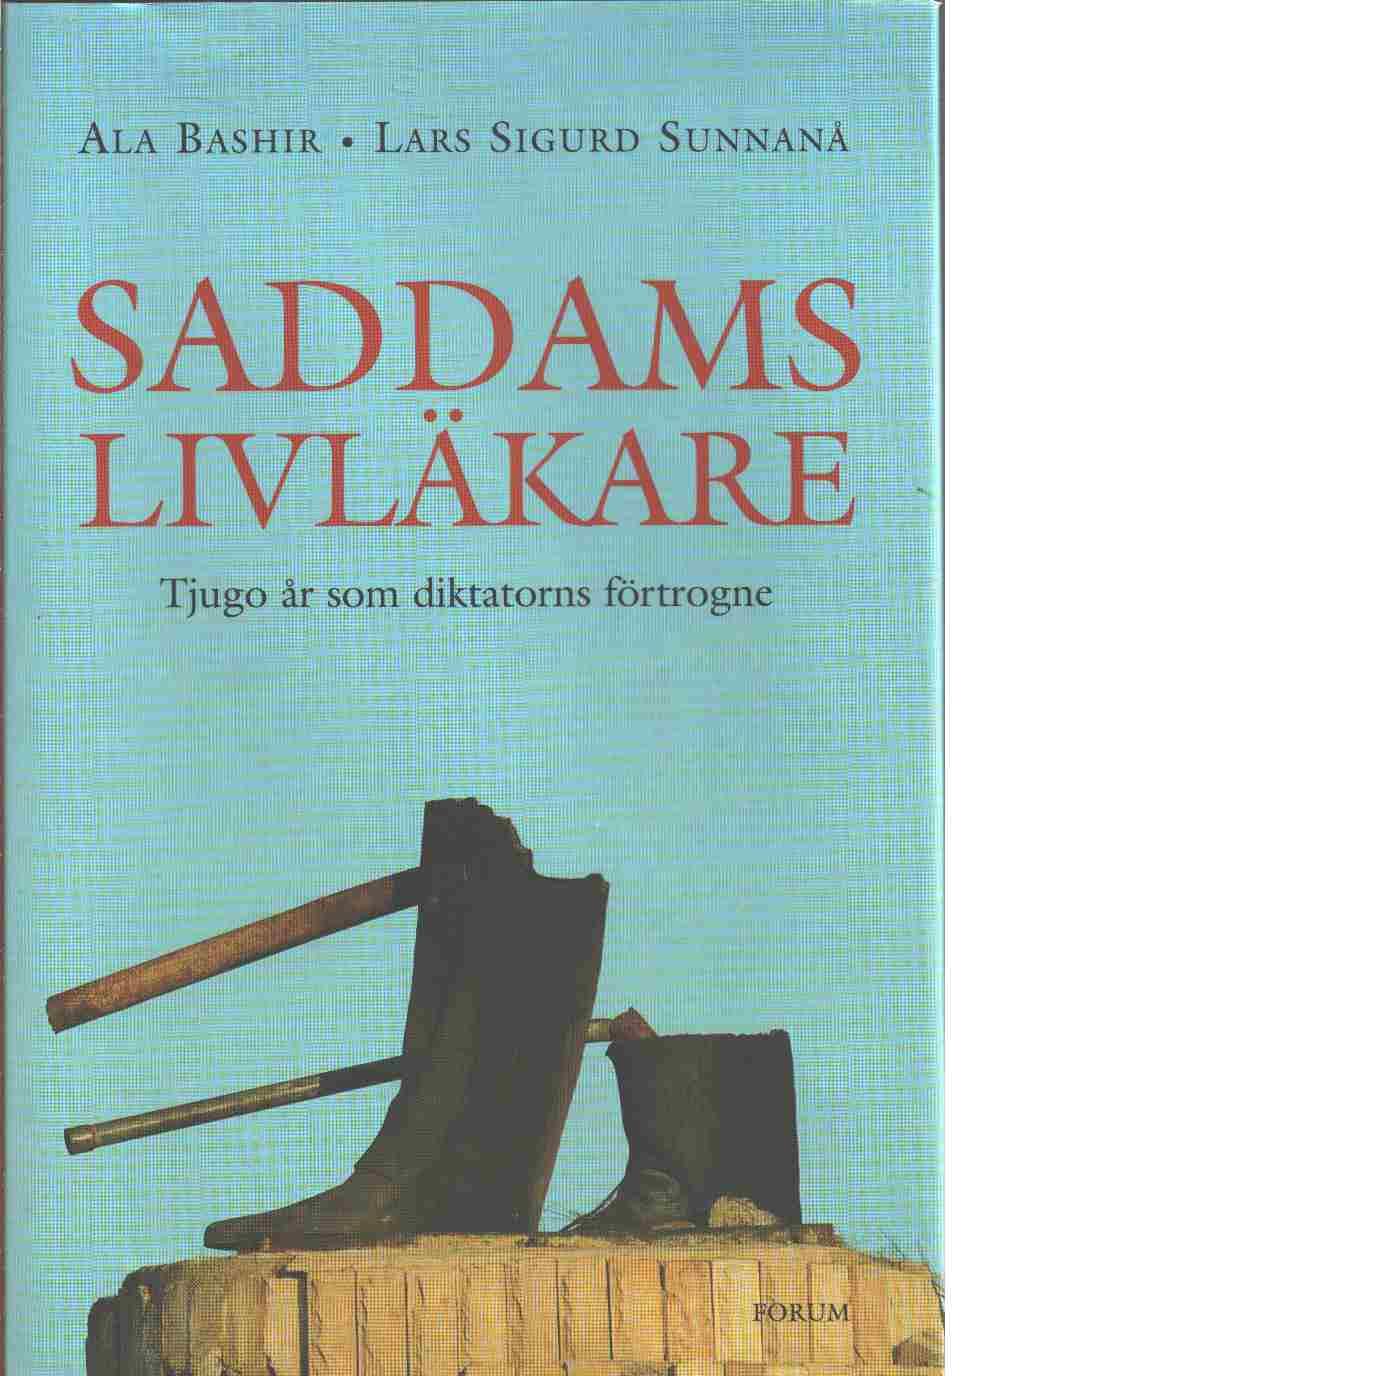 Saddams livläkare : tjugo år som diktatorns förtrogne - Bashir, Ala